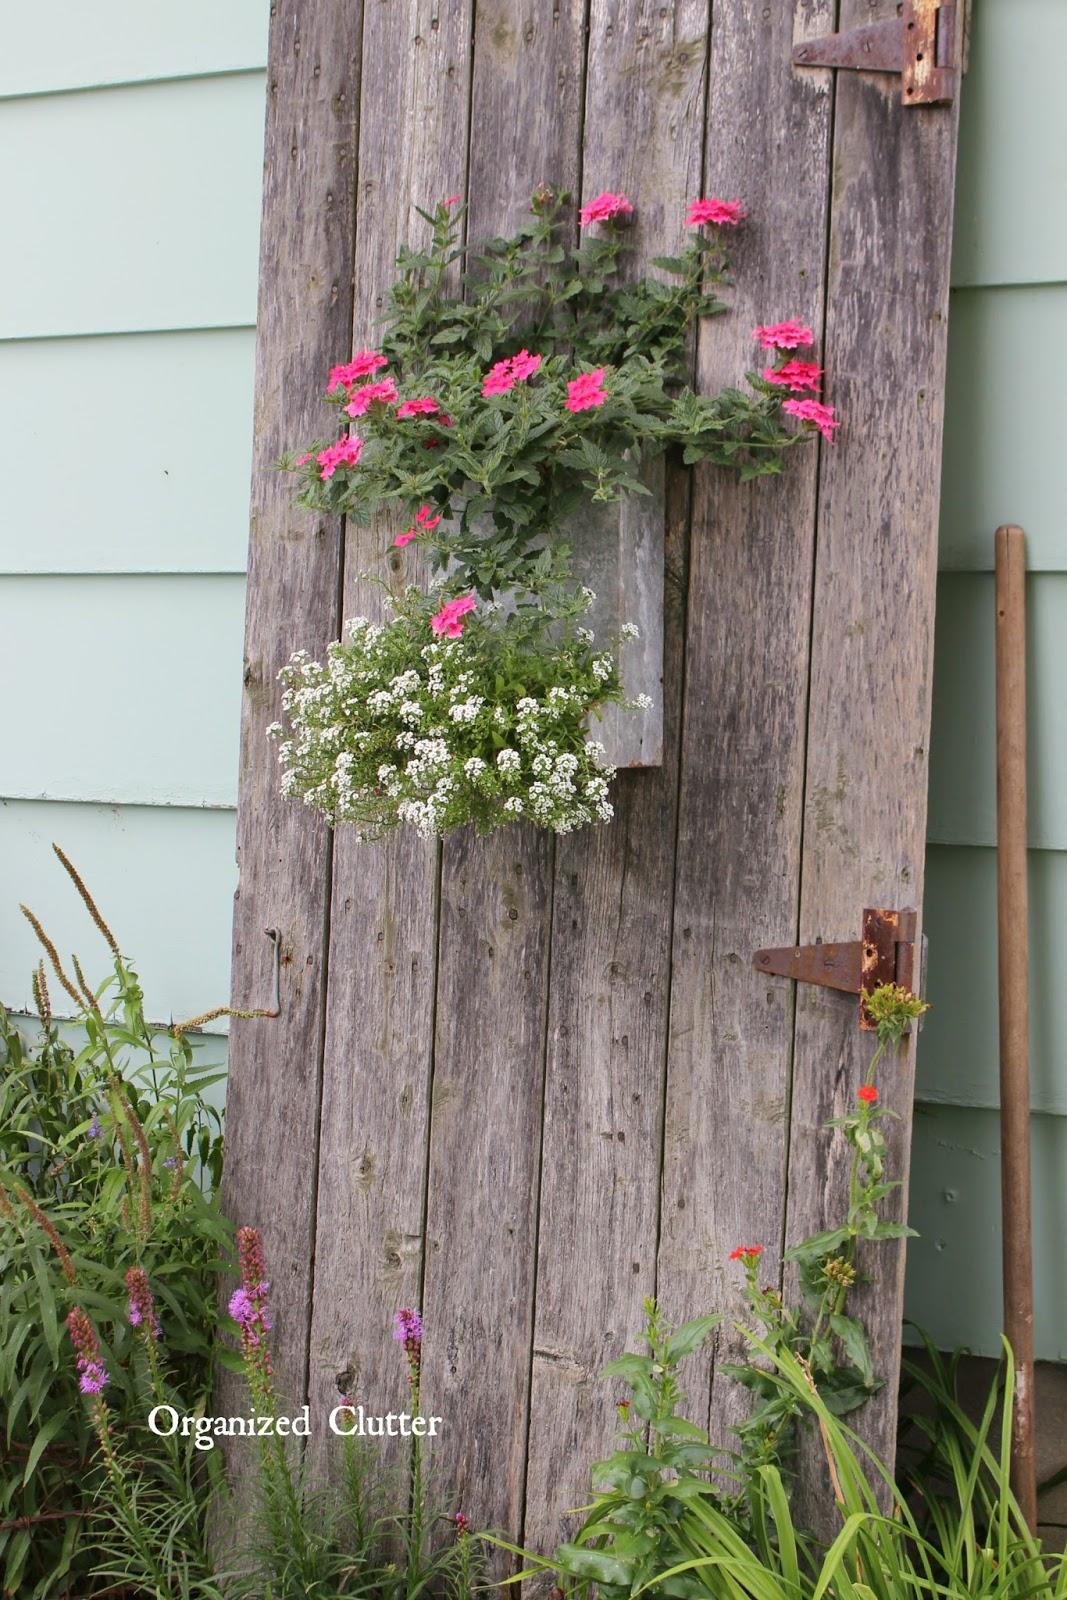 My Friend Danita's Rustic Garden Decor | Organized Clutter on Rustic Backyard Ideas id=50931